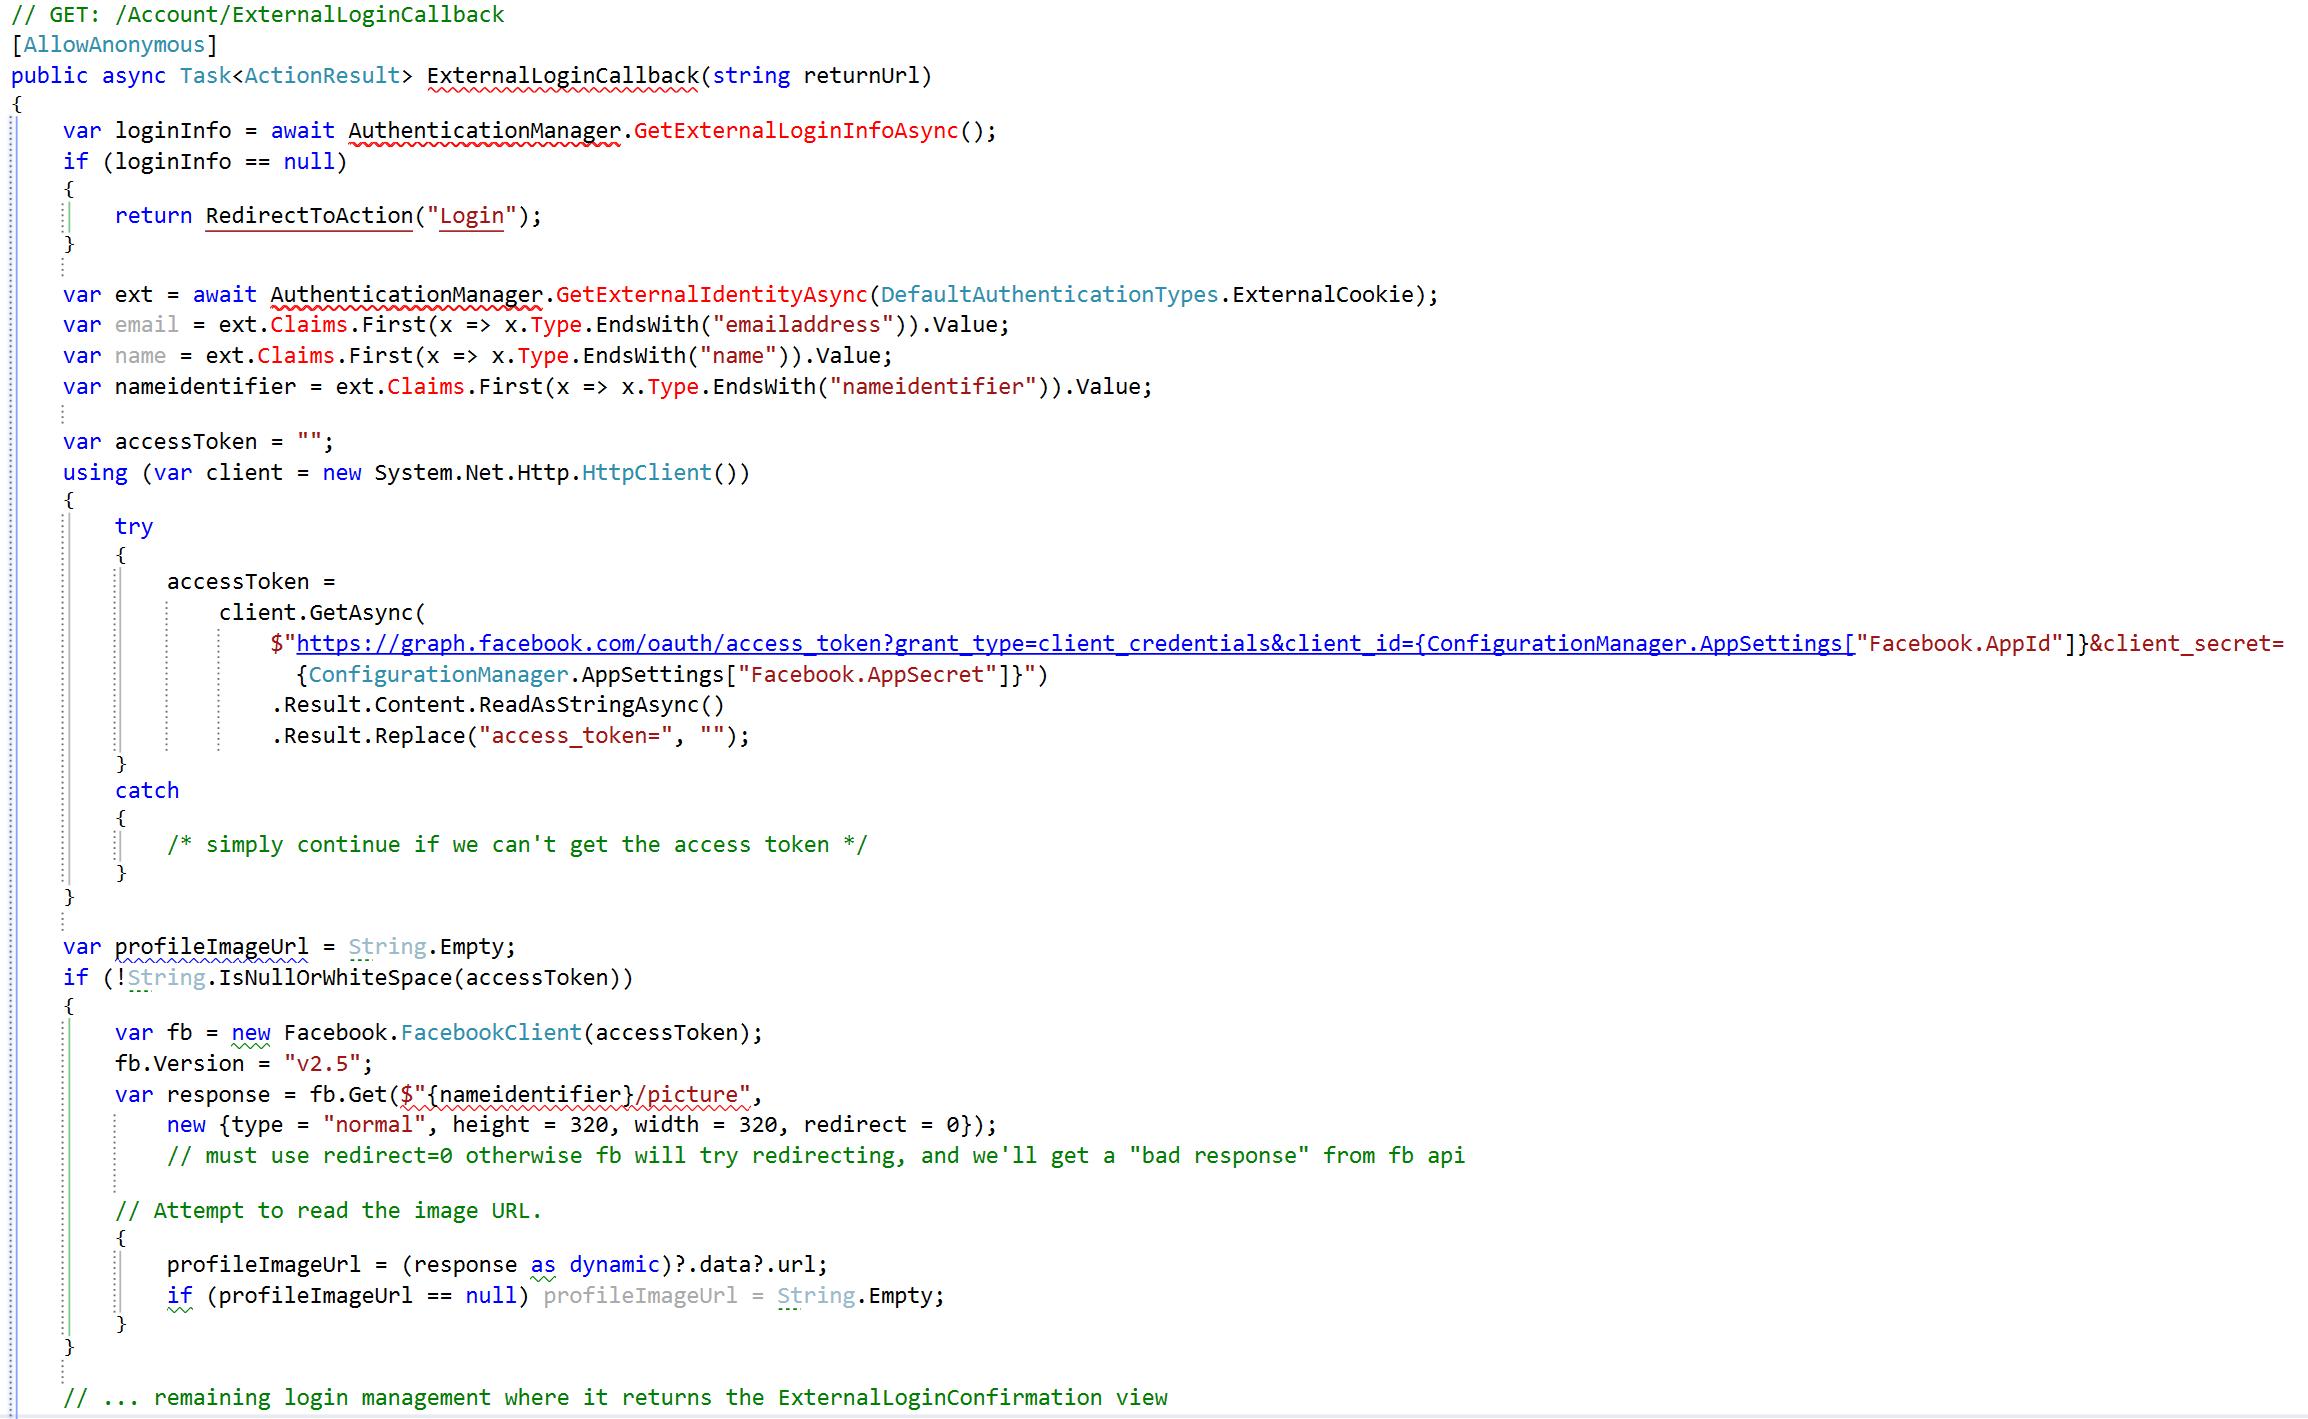 ExternalLoginCallback Code